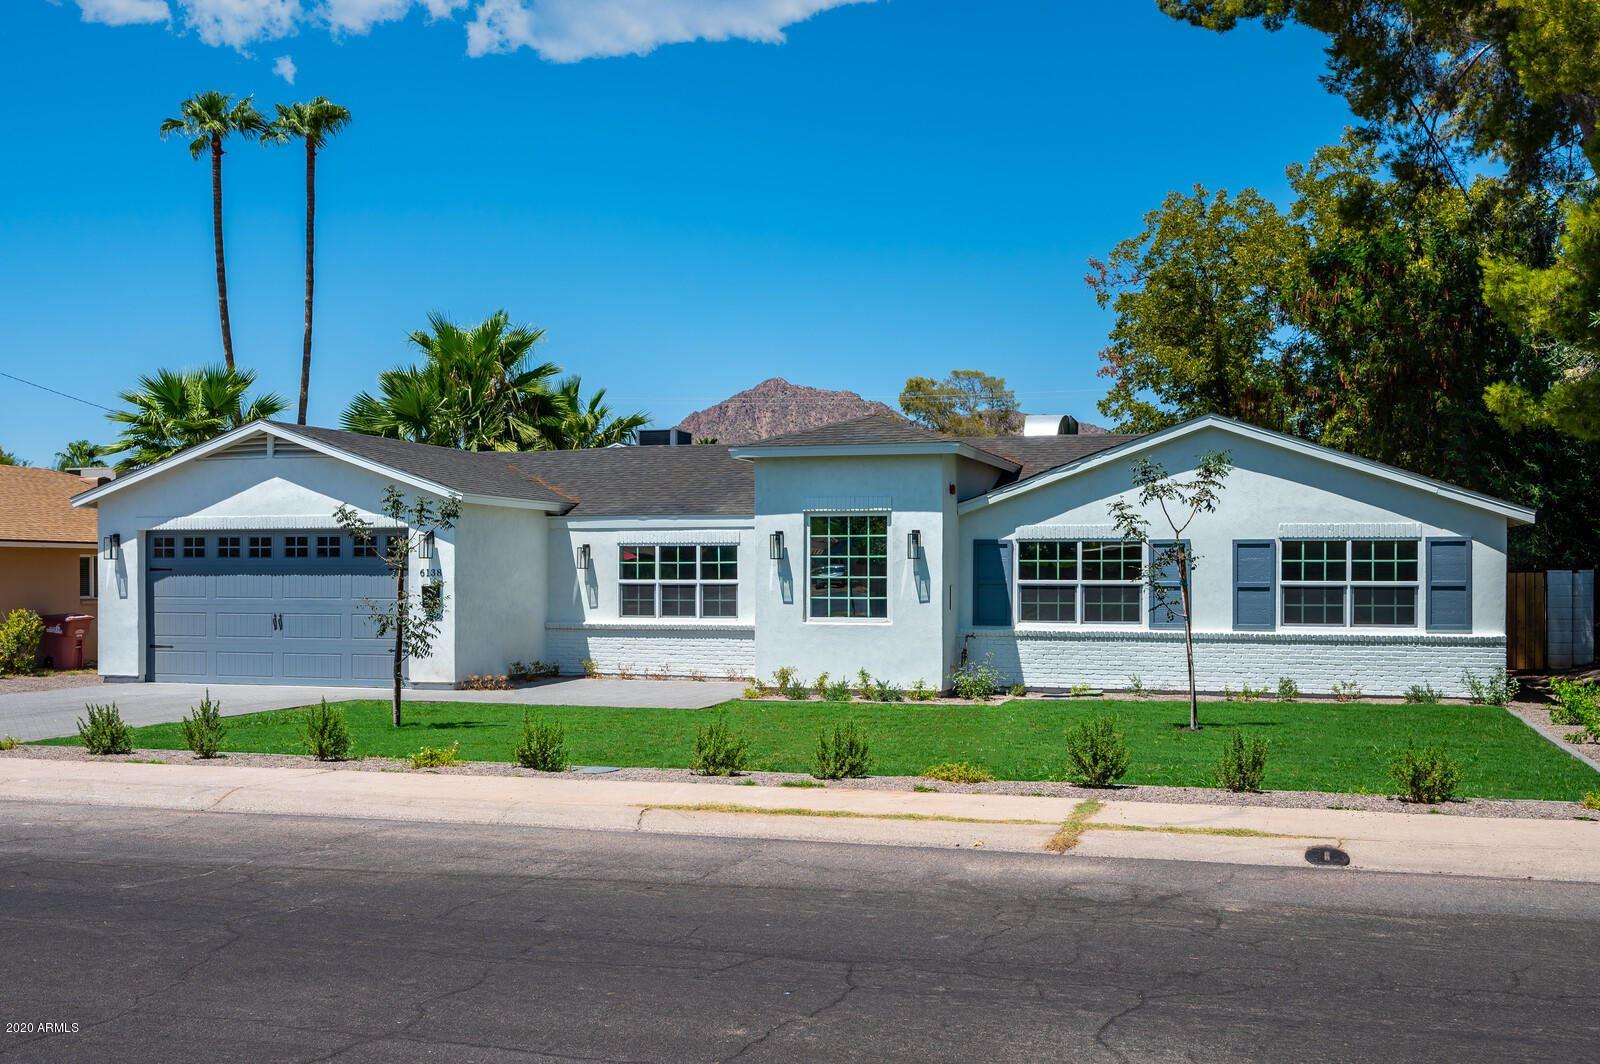 6138 E ROSE CIRCLE Drive, Scottsdale, AZ 85251 - MLS#: 6113211